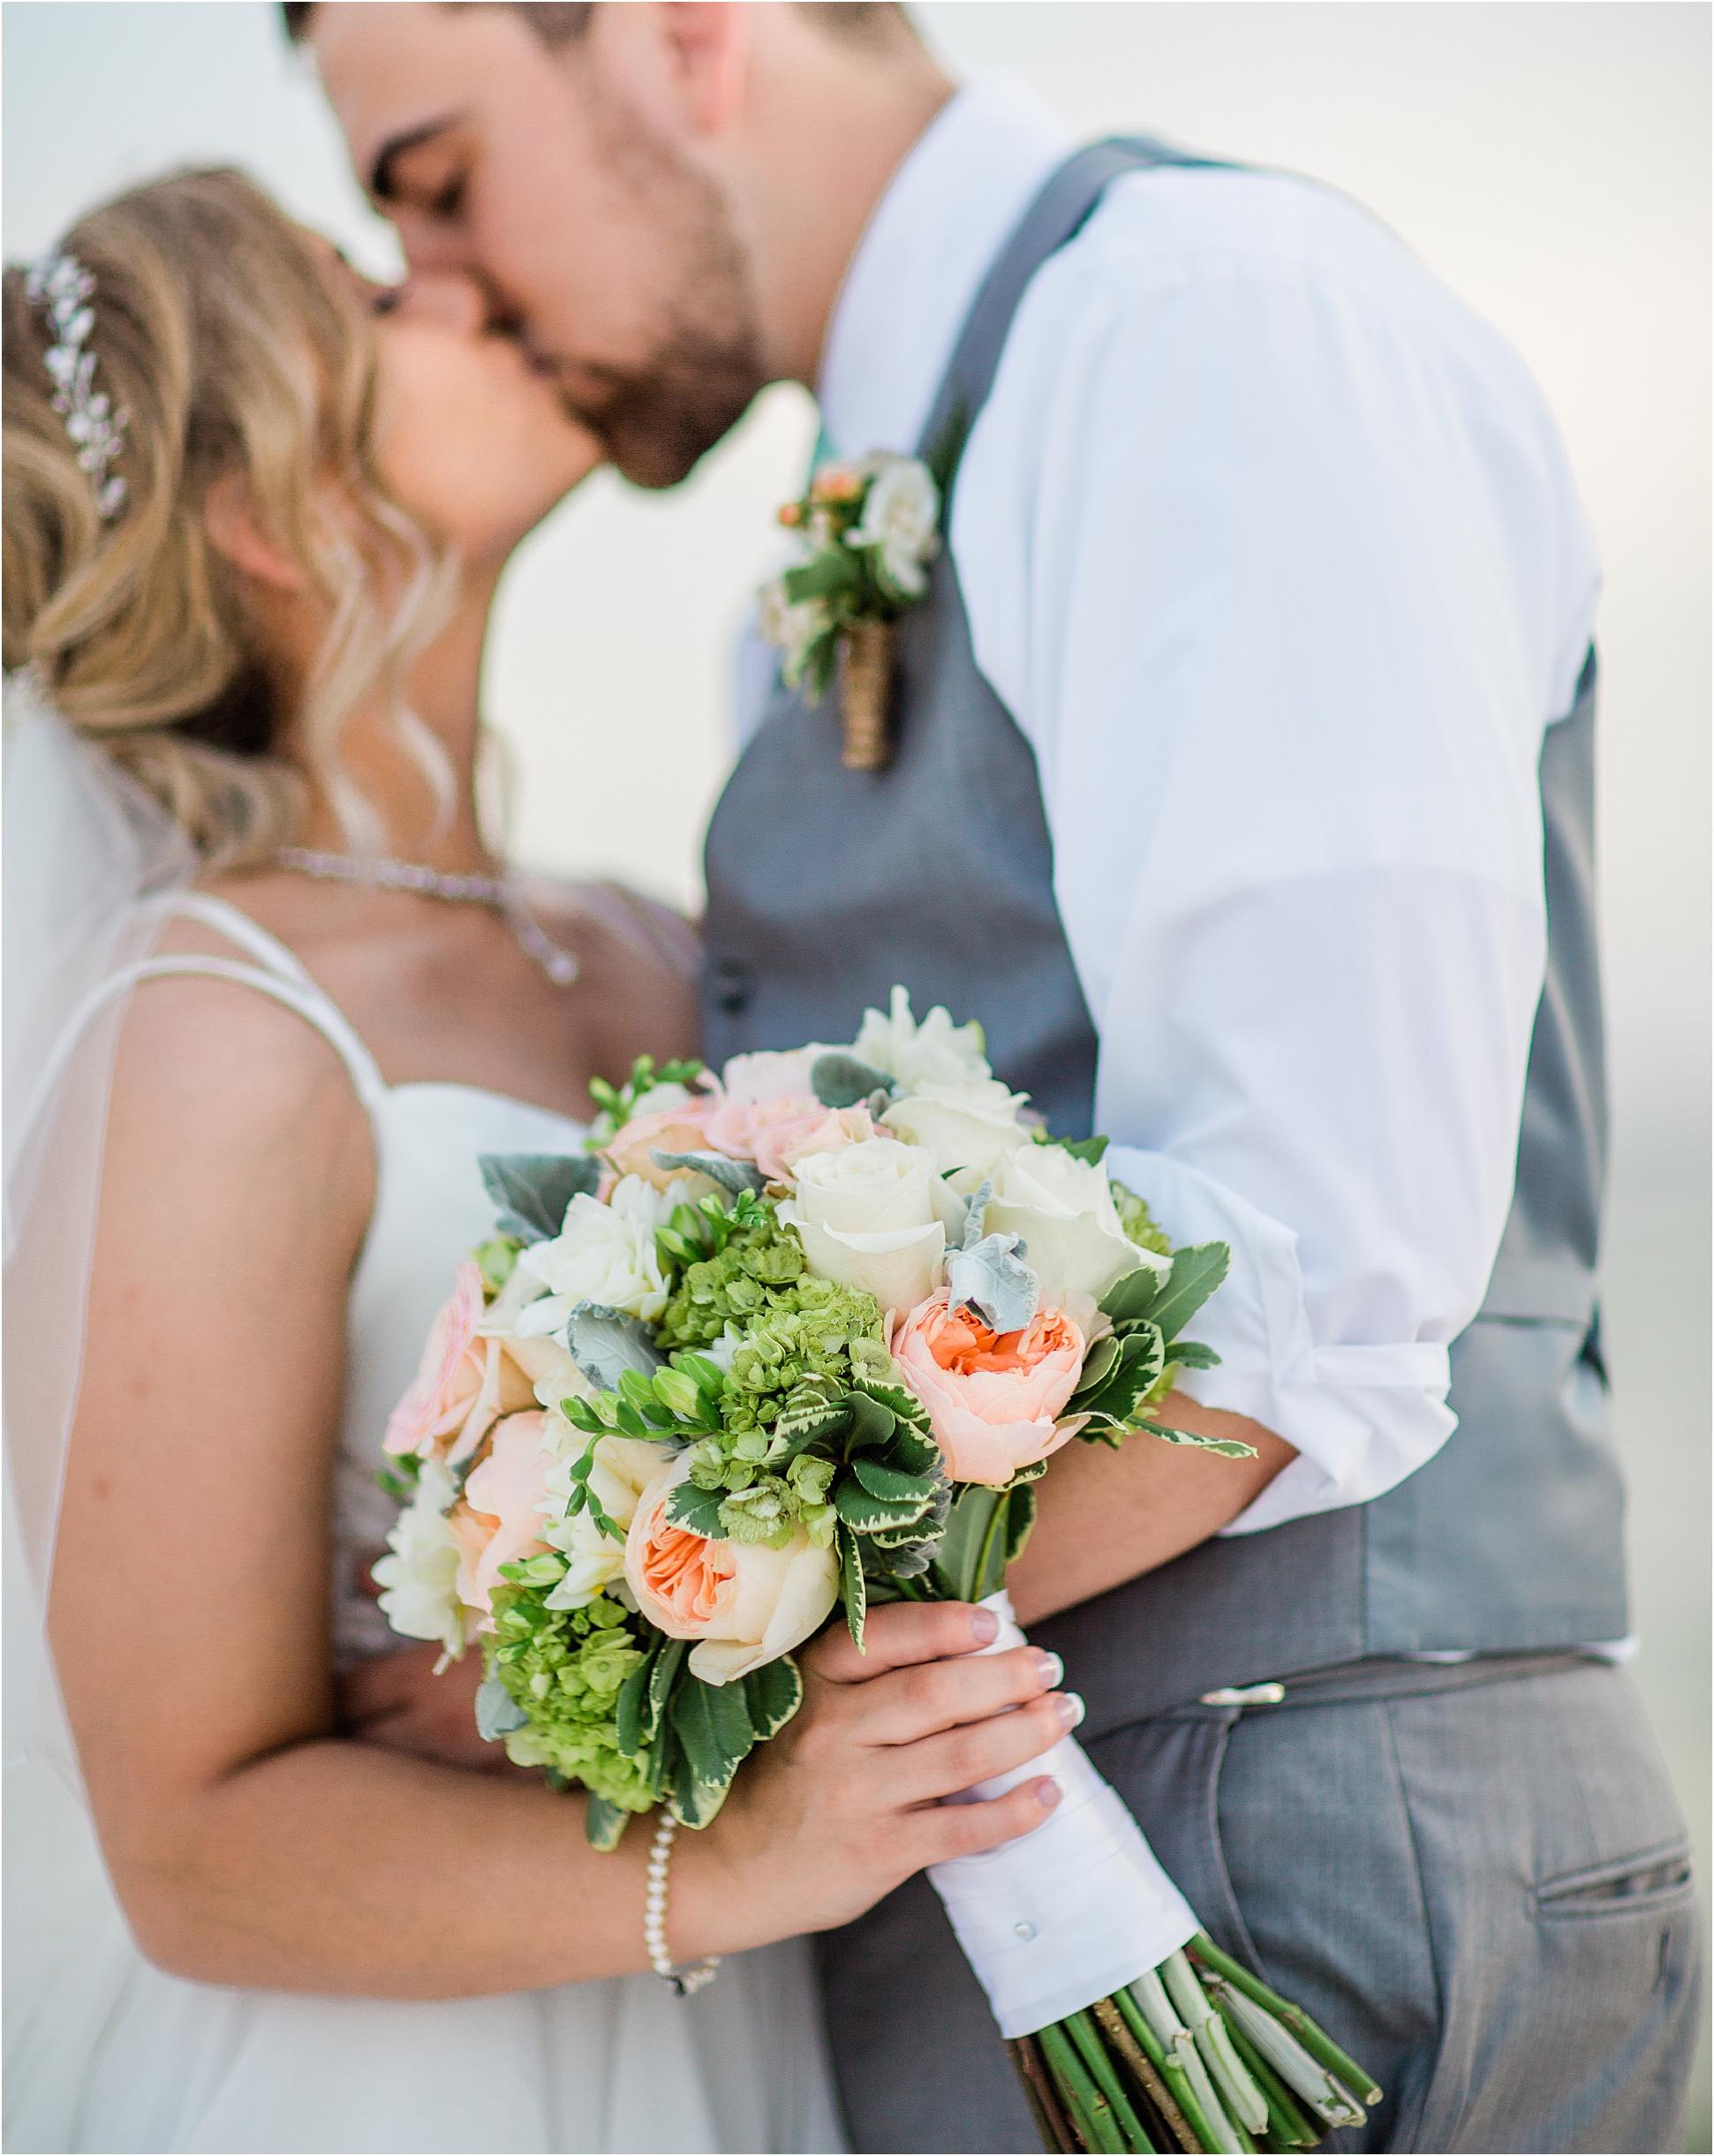 Wedding Florist in Gulf Shores, Alabama